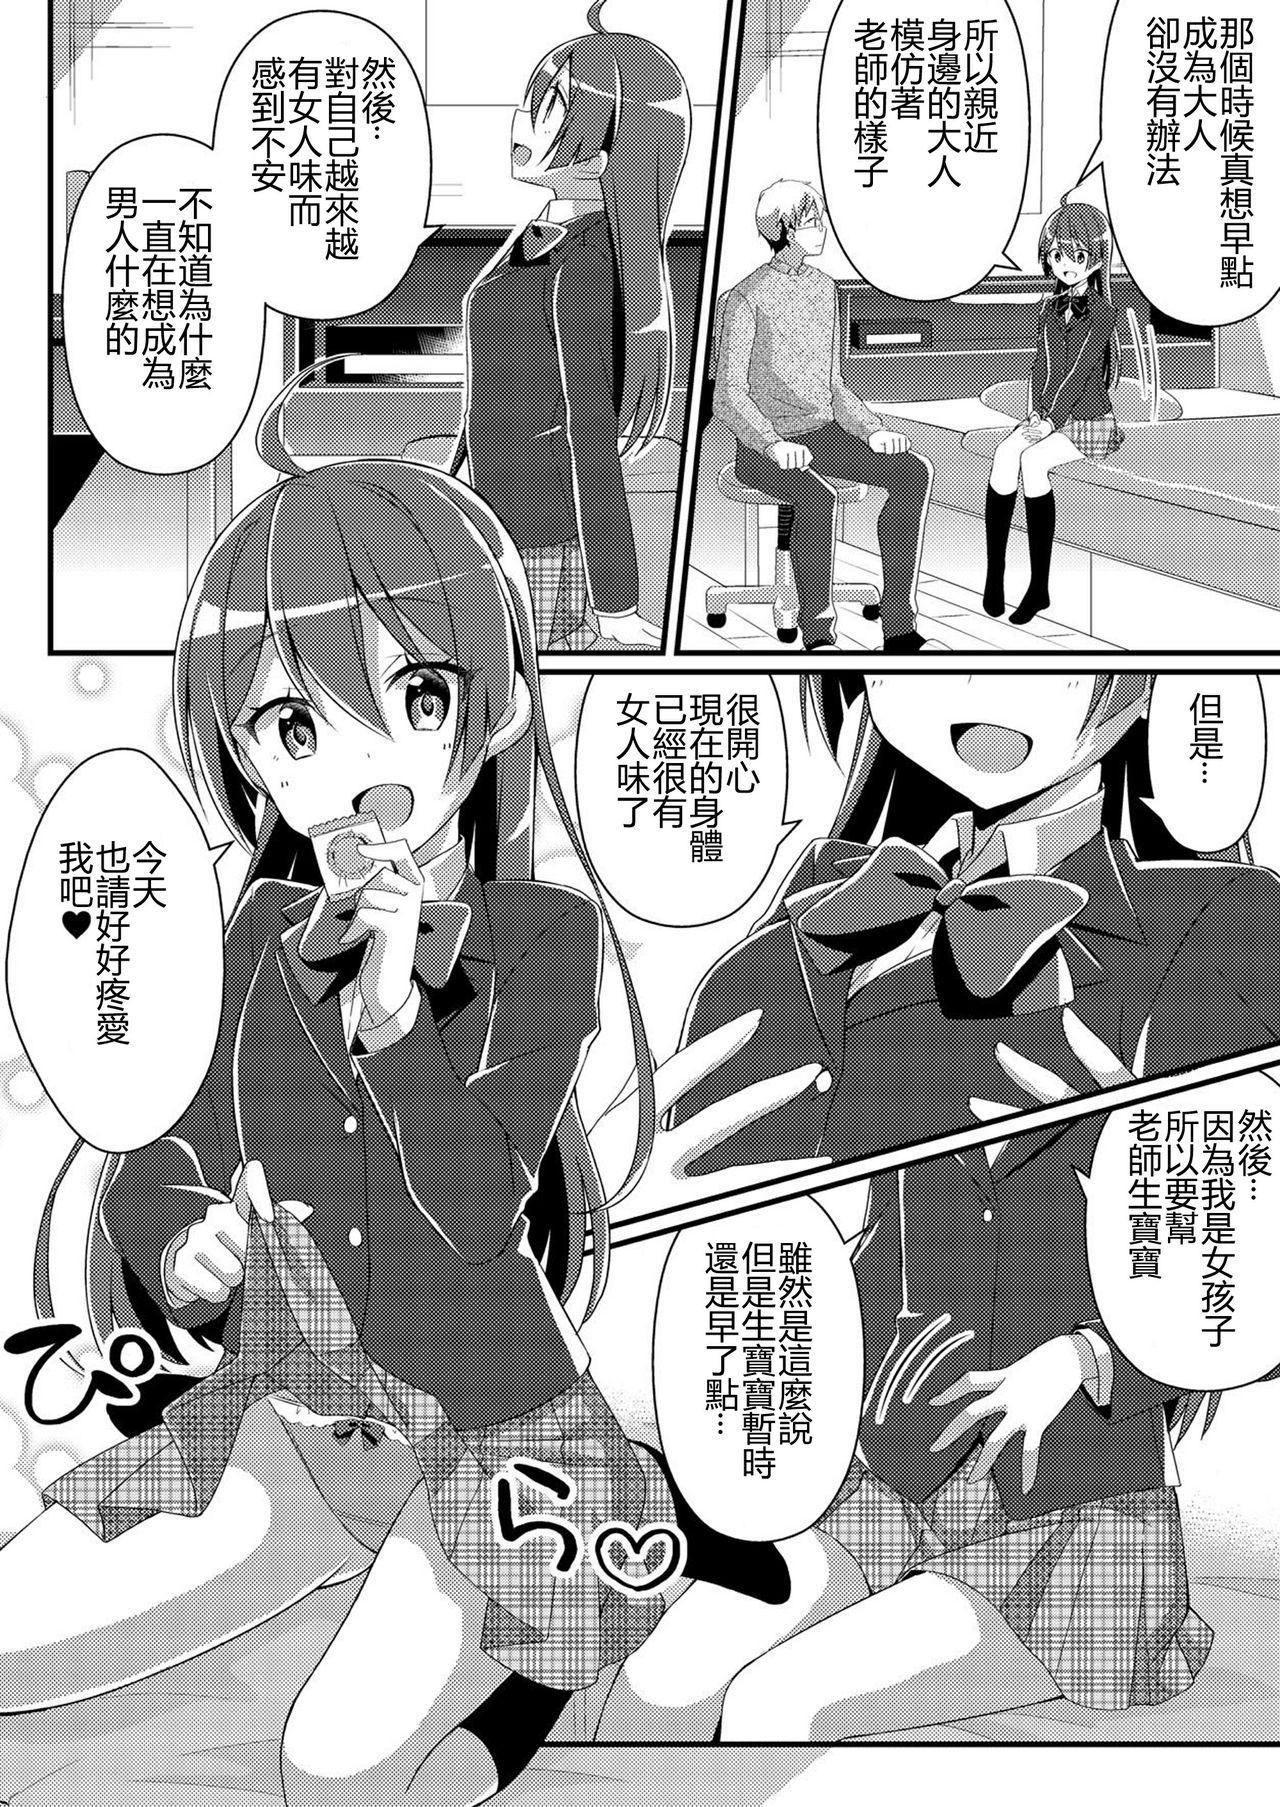 Toshiue e no Doukei 33